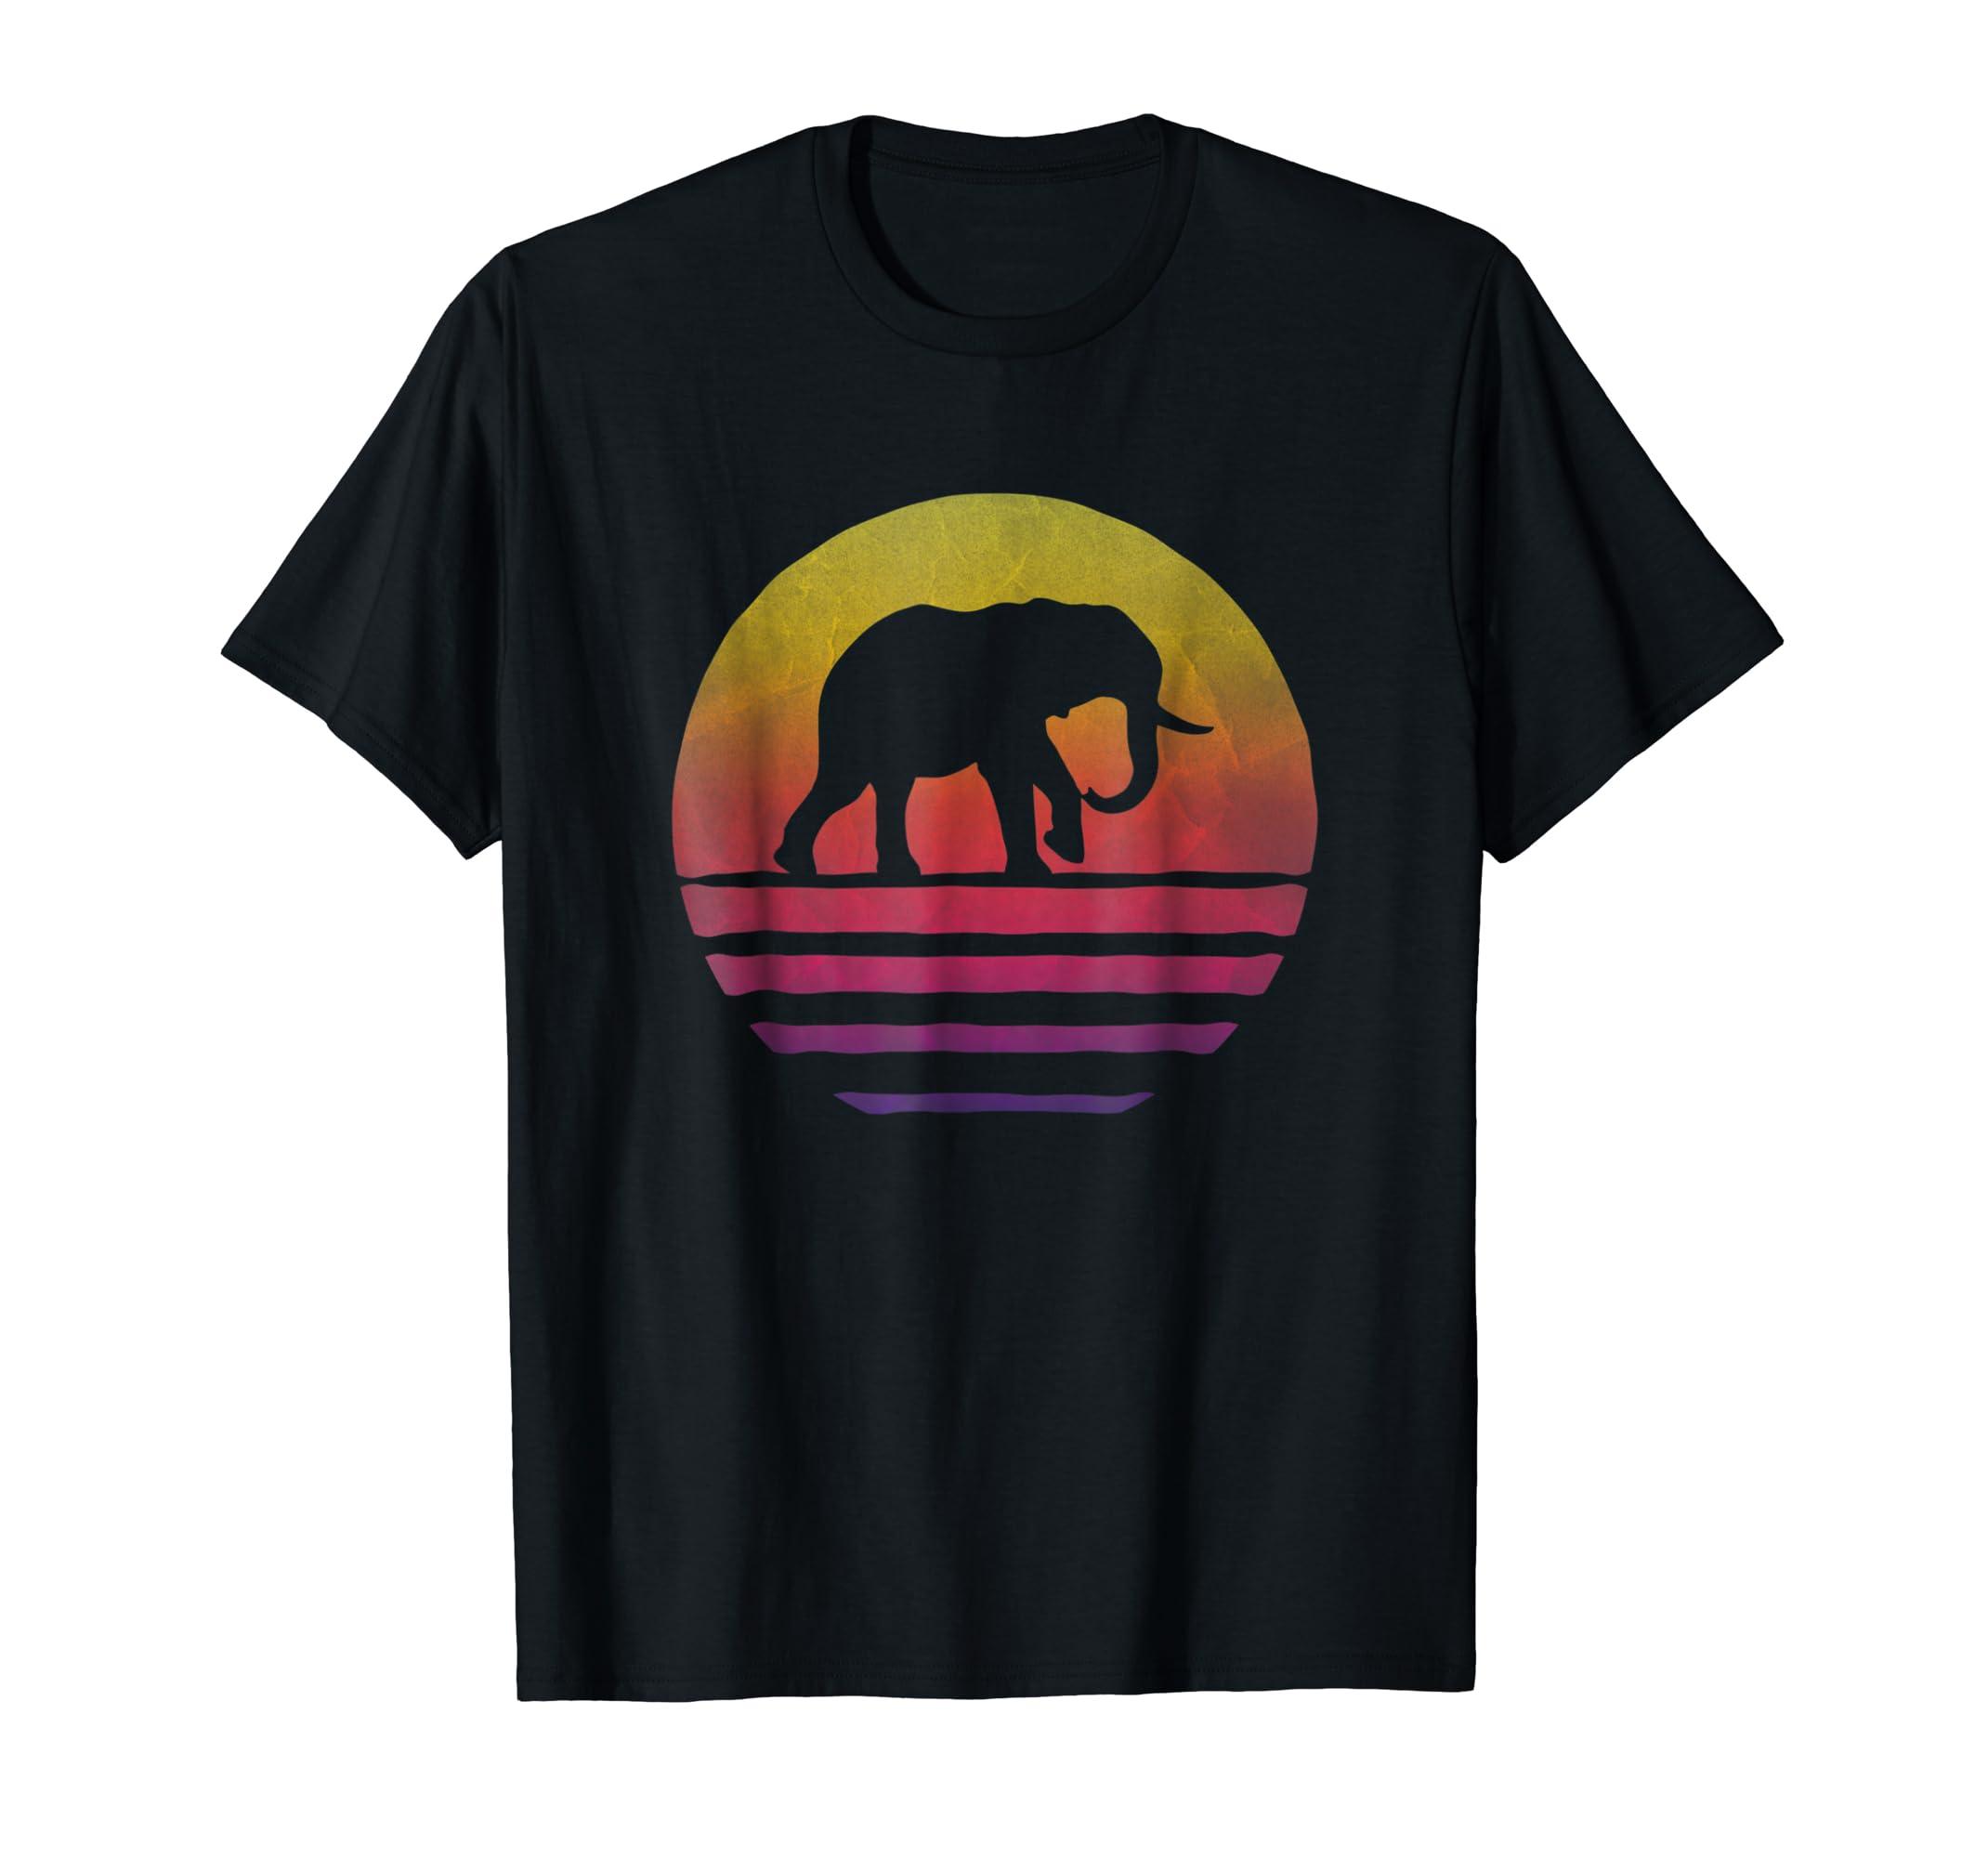 Elephant Shirt Retro Vintage 70s Boho Distressed Women Men-Men's T-Shirt-Black